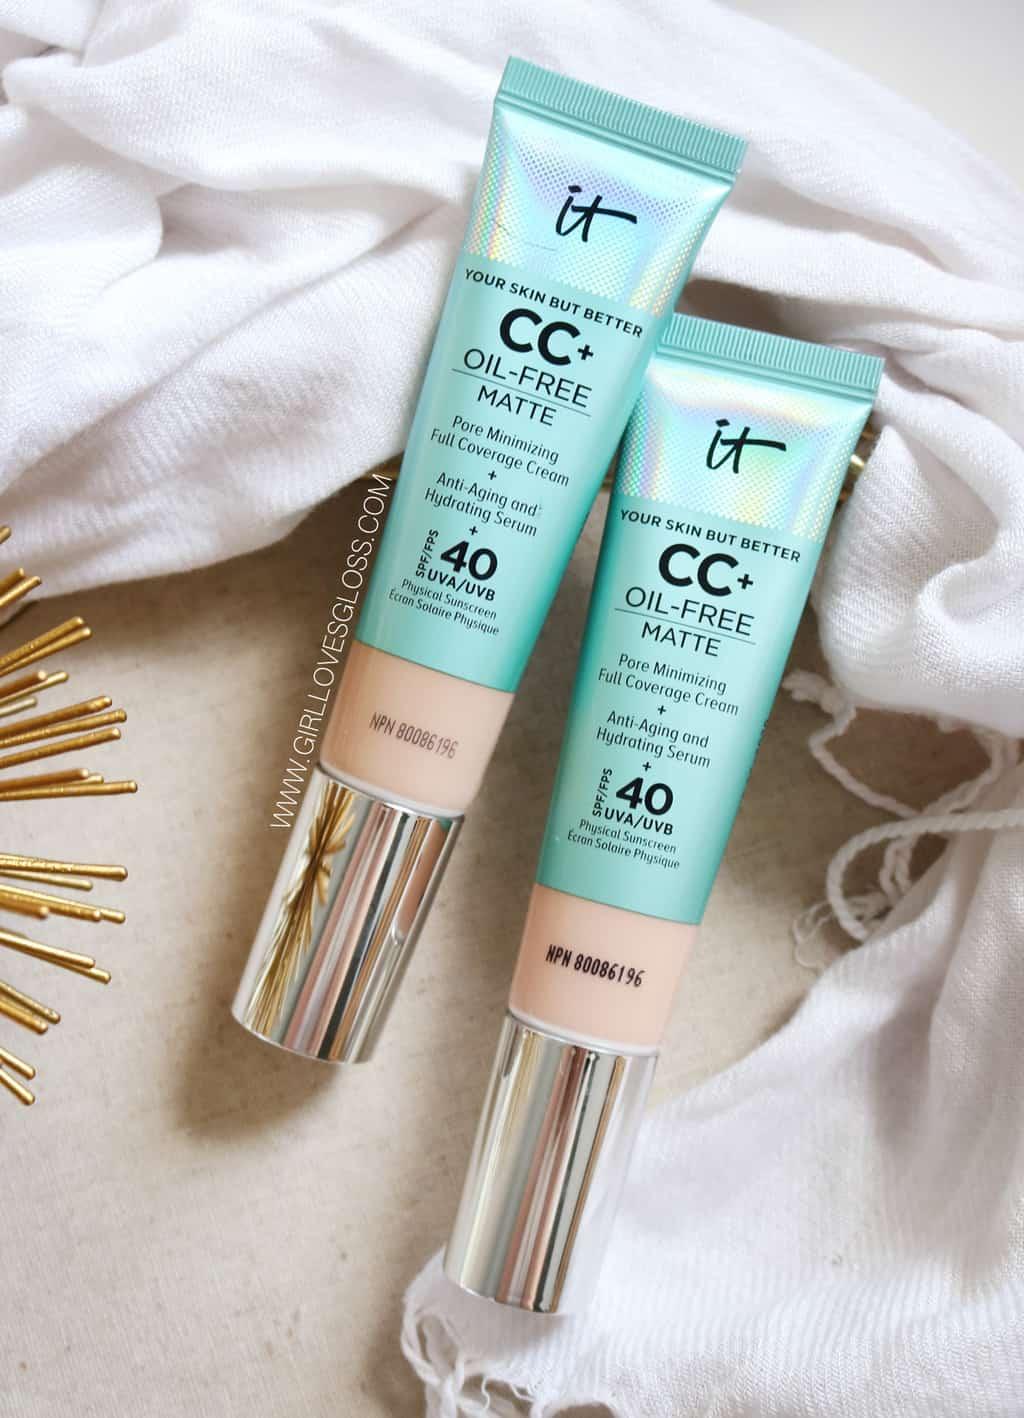 IT Cosmetics Matte CC Cream on Dry Skin